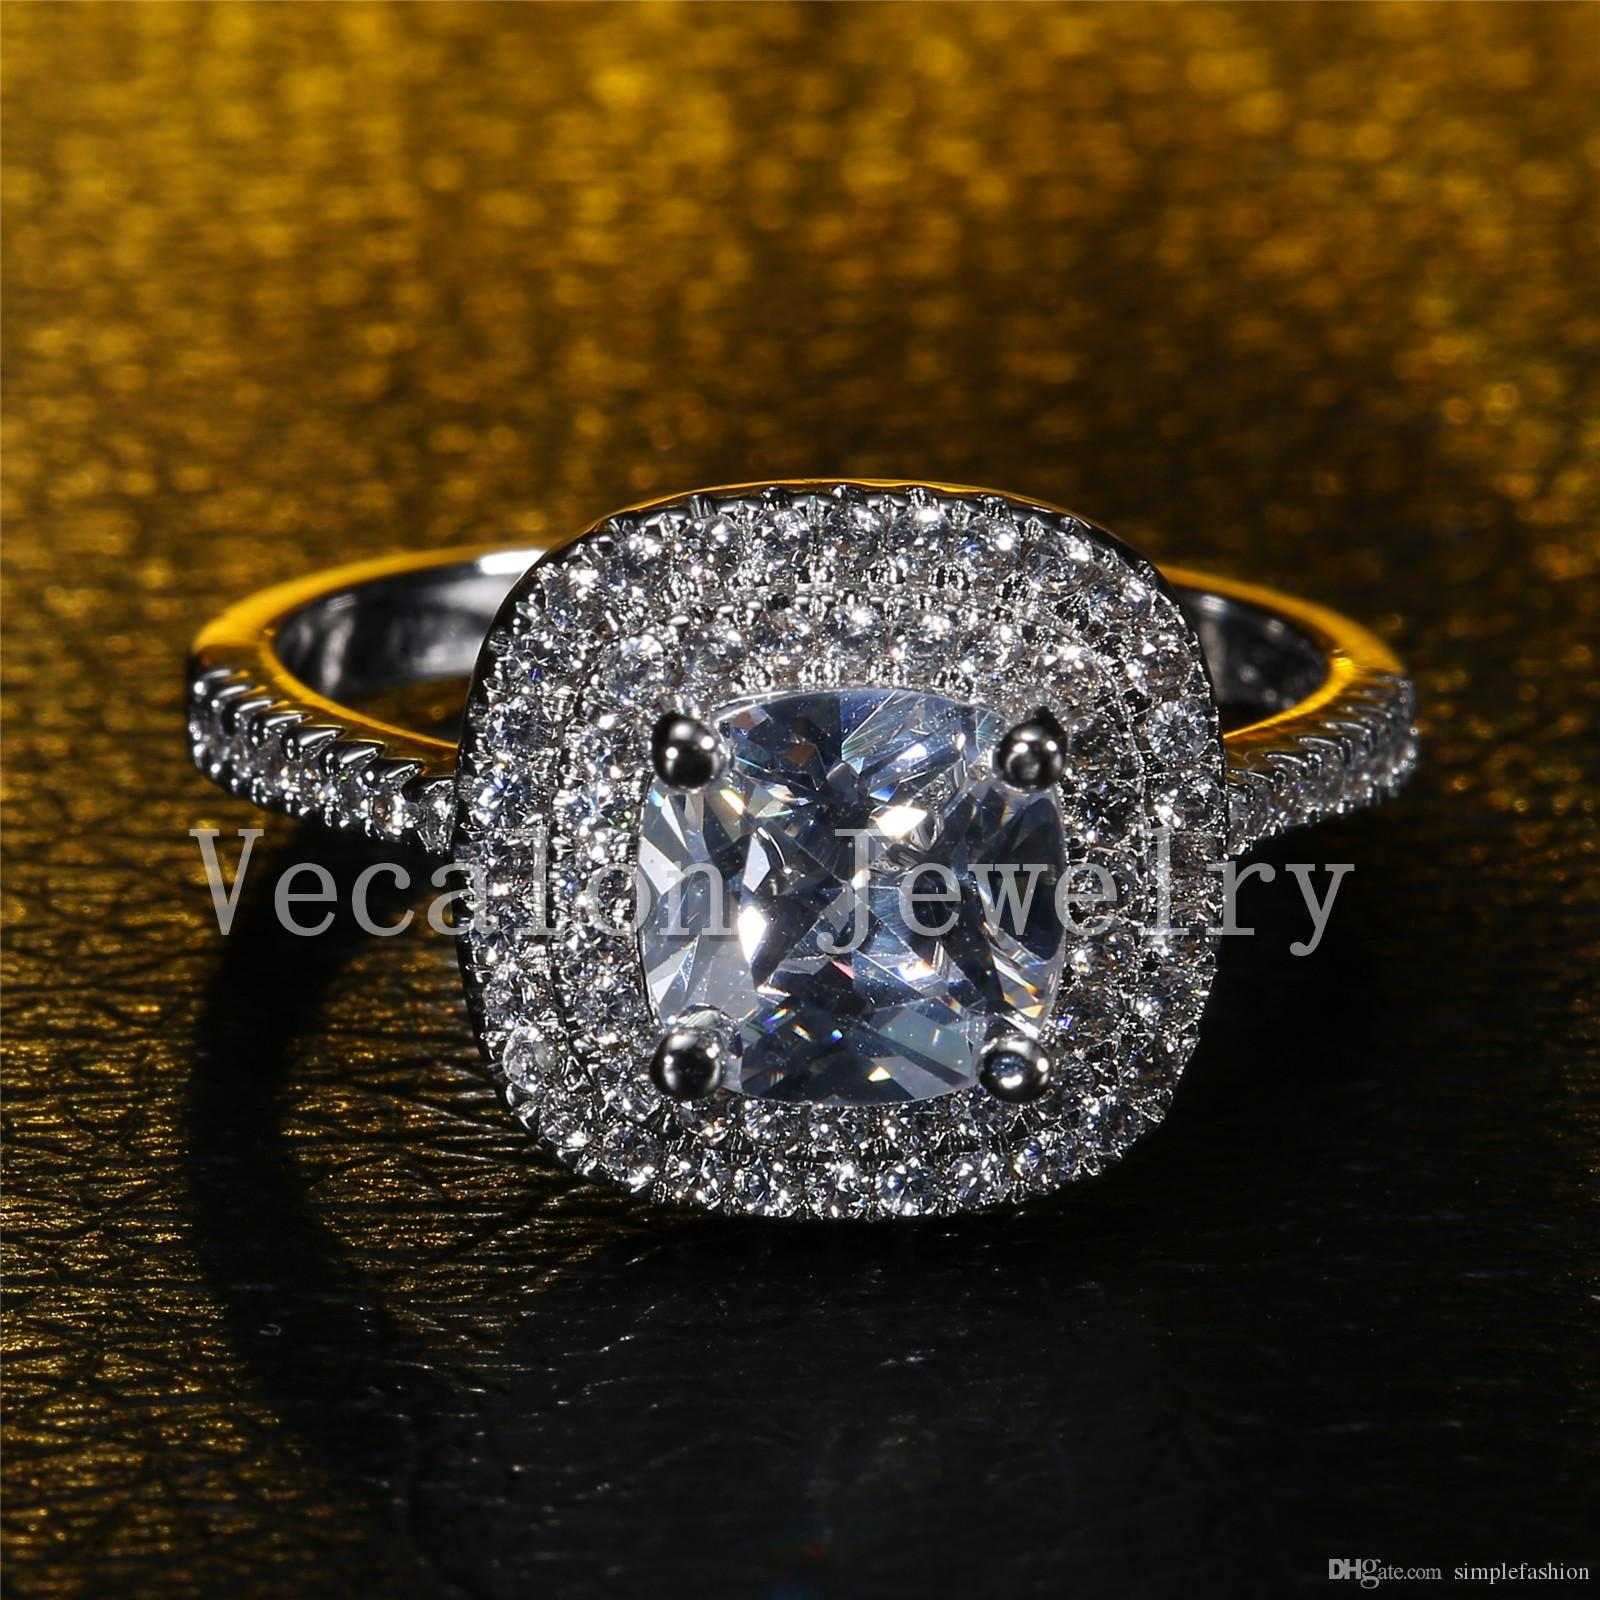 Vecalon 2016 moda anillo de bodas de compromiso de diseño para las mujeres 3ct diamante simulado Cz 925 anillo de plata de la banda femenina